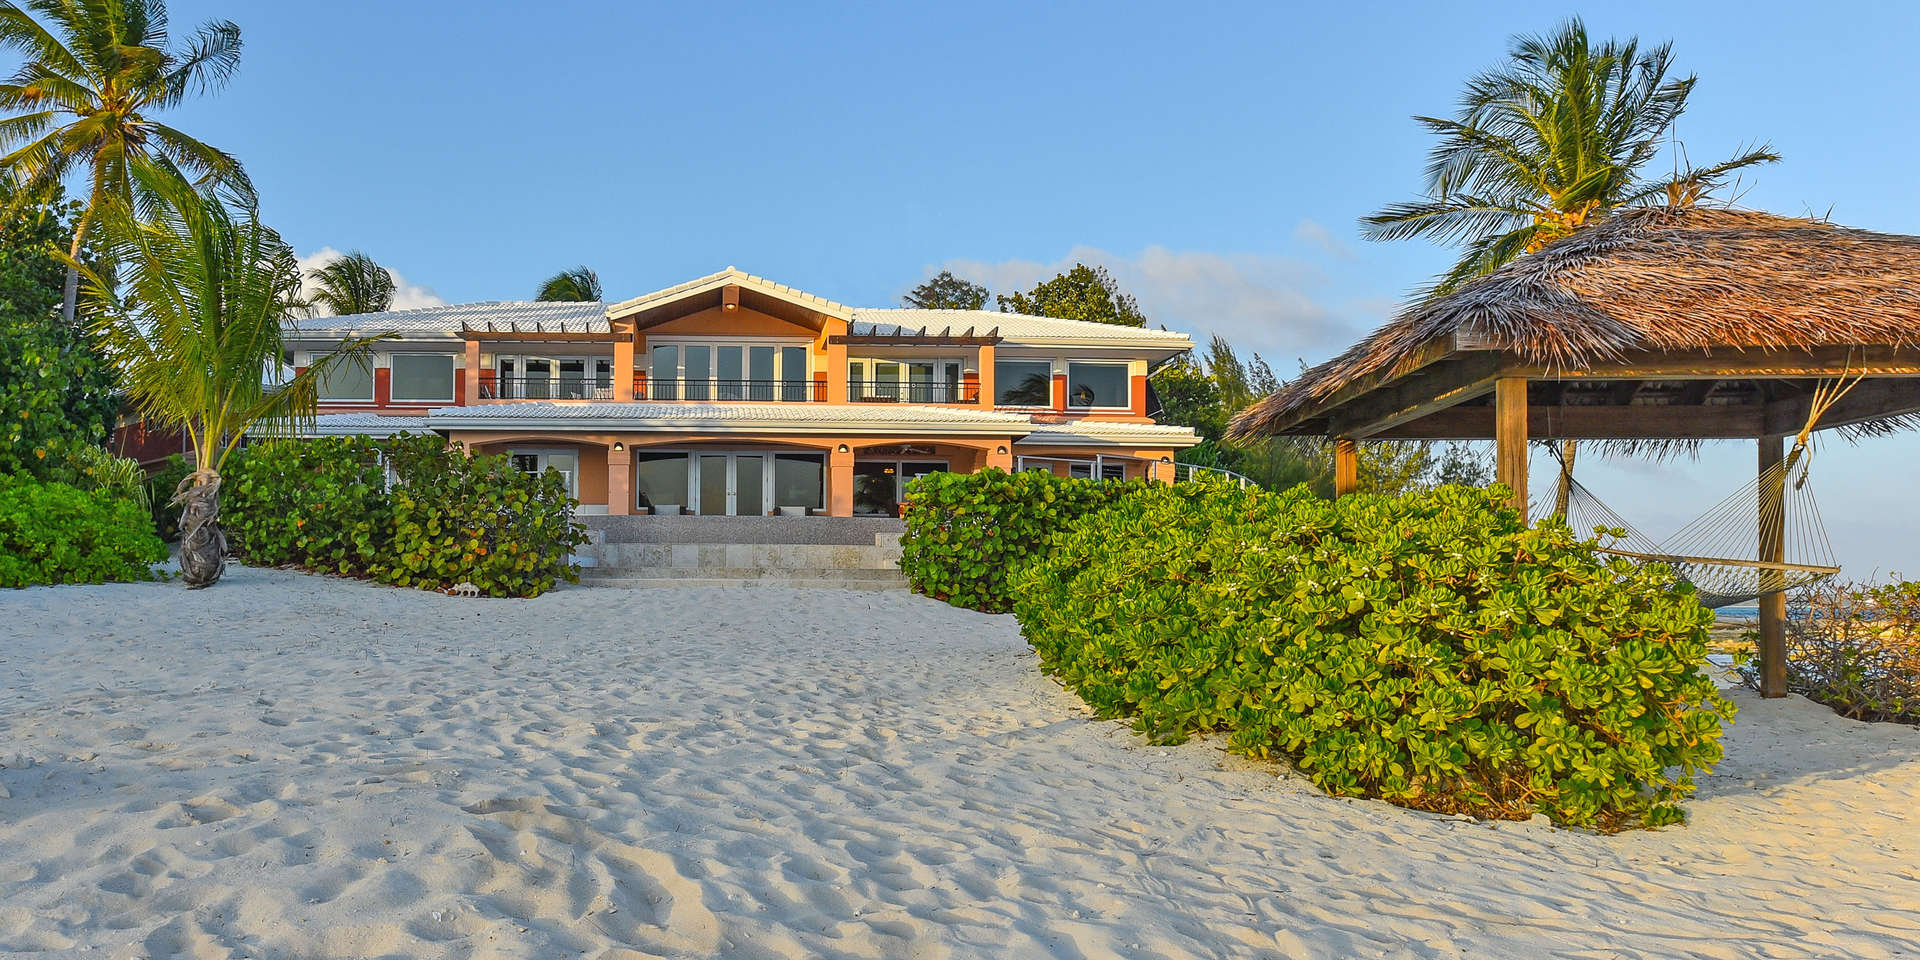 Luxury villa rentals caribbean - Cayman islands - Grand cayman - Bodden town - Pease Bay Estate - Image 1/19